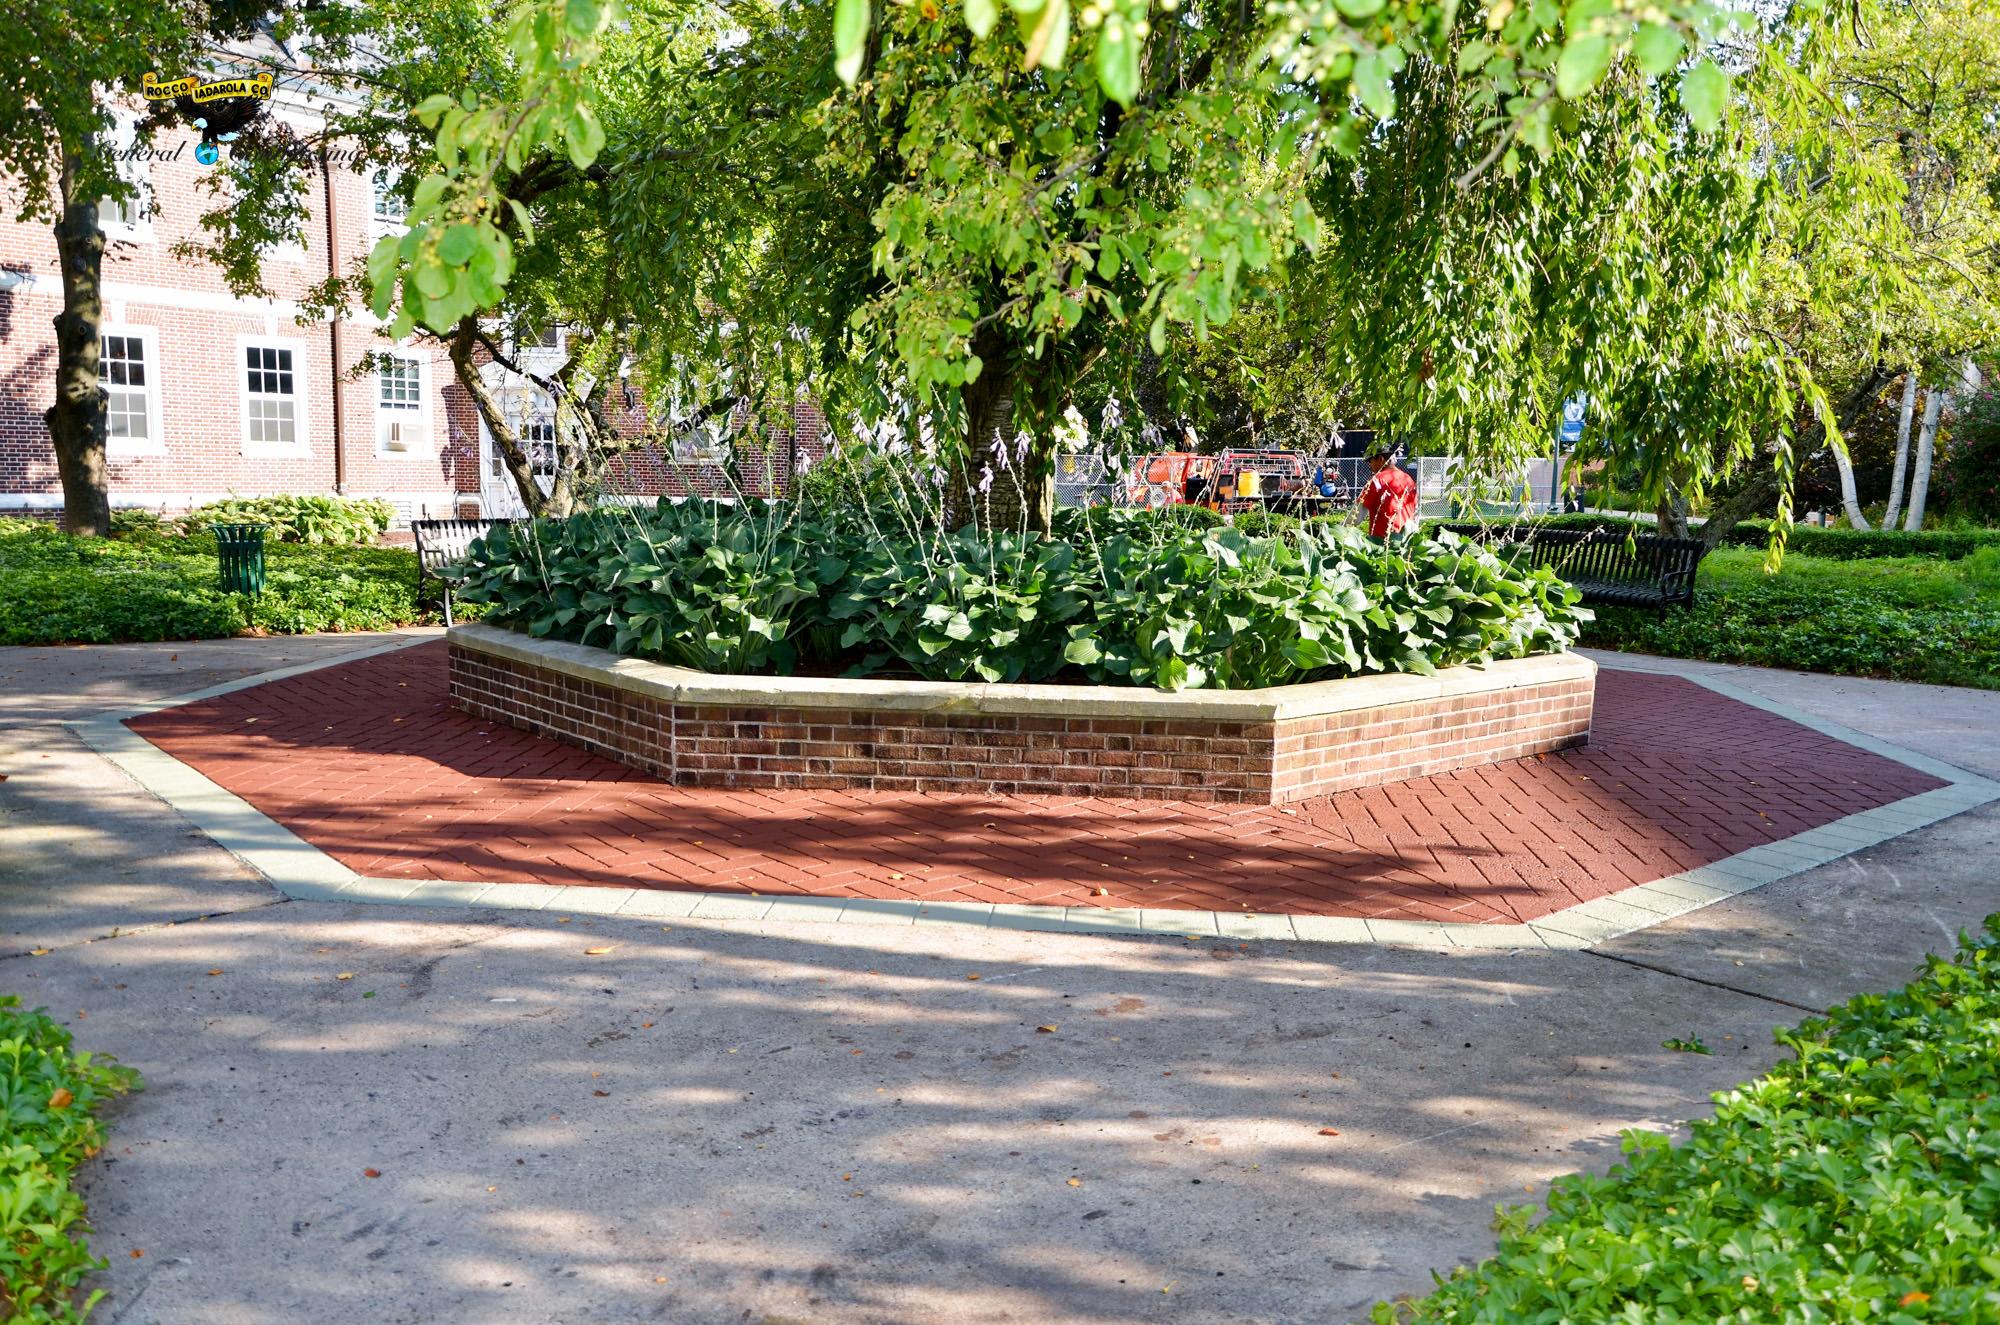 Marcus White Hall CCSU Central Connecticut State University Rocco Iadarola Asphalting-106.jpg